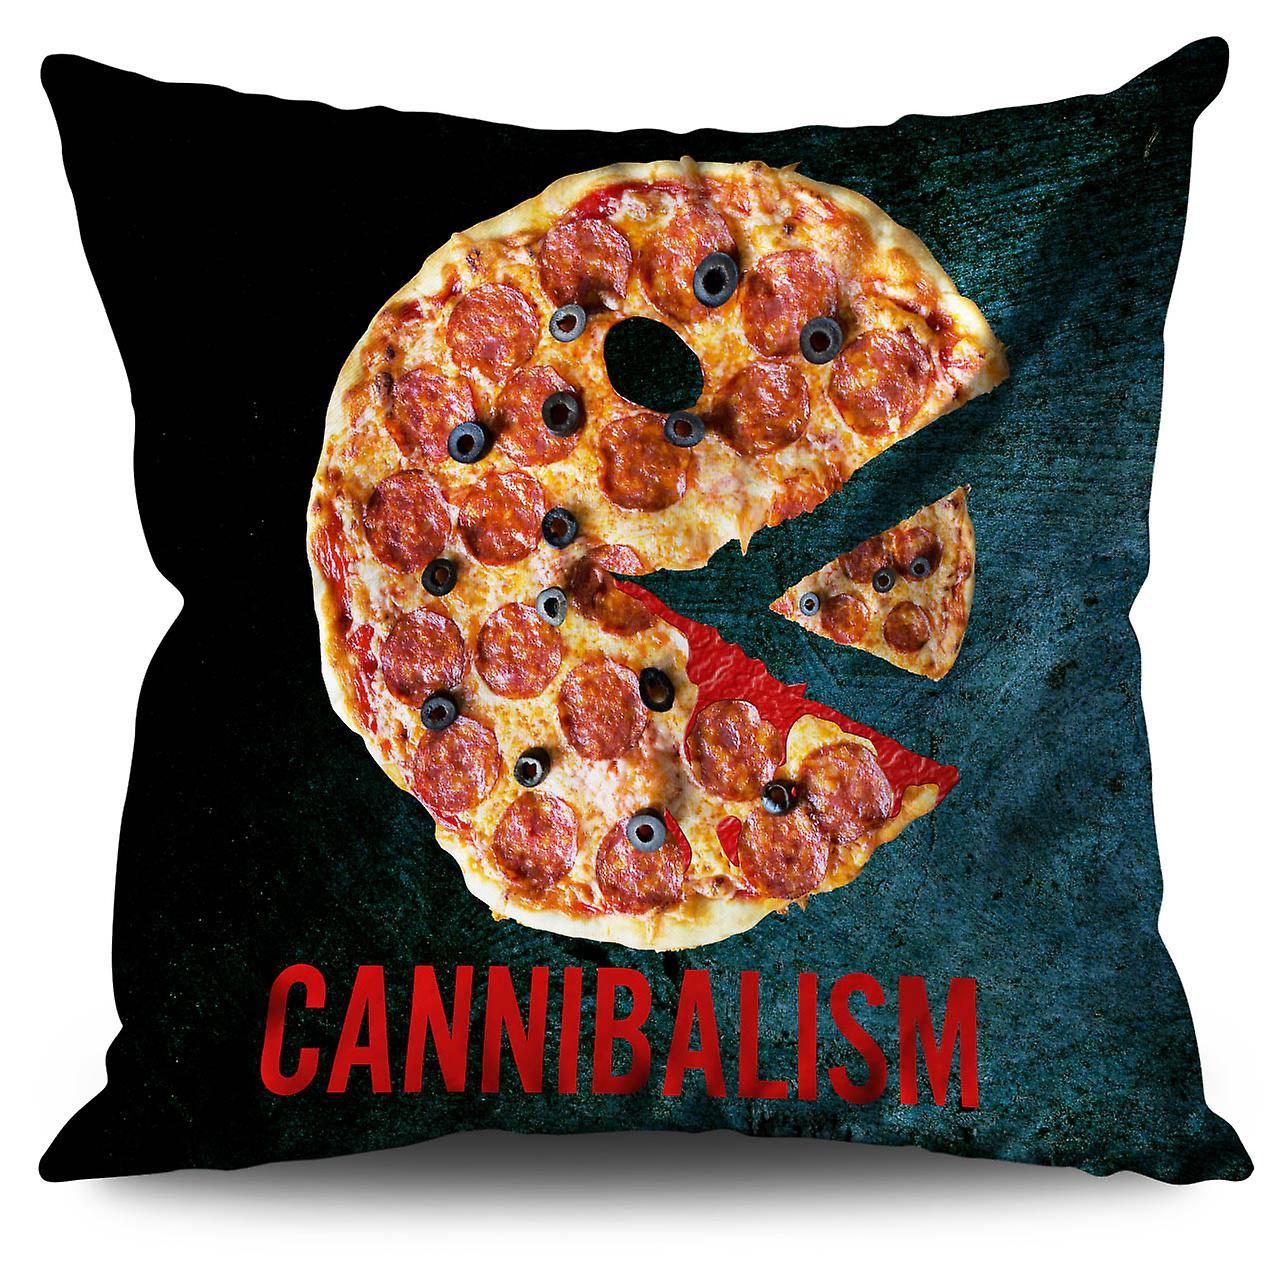 Cuisine De Pizza Cannibale Linge Coussin X CmWellcoda 30 EH9WID2